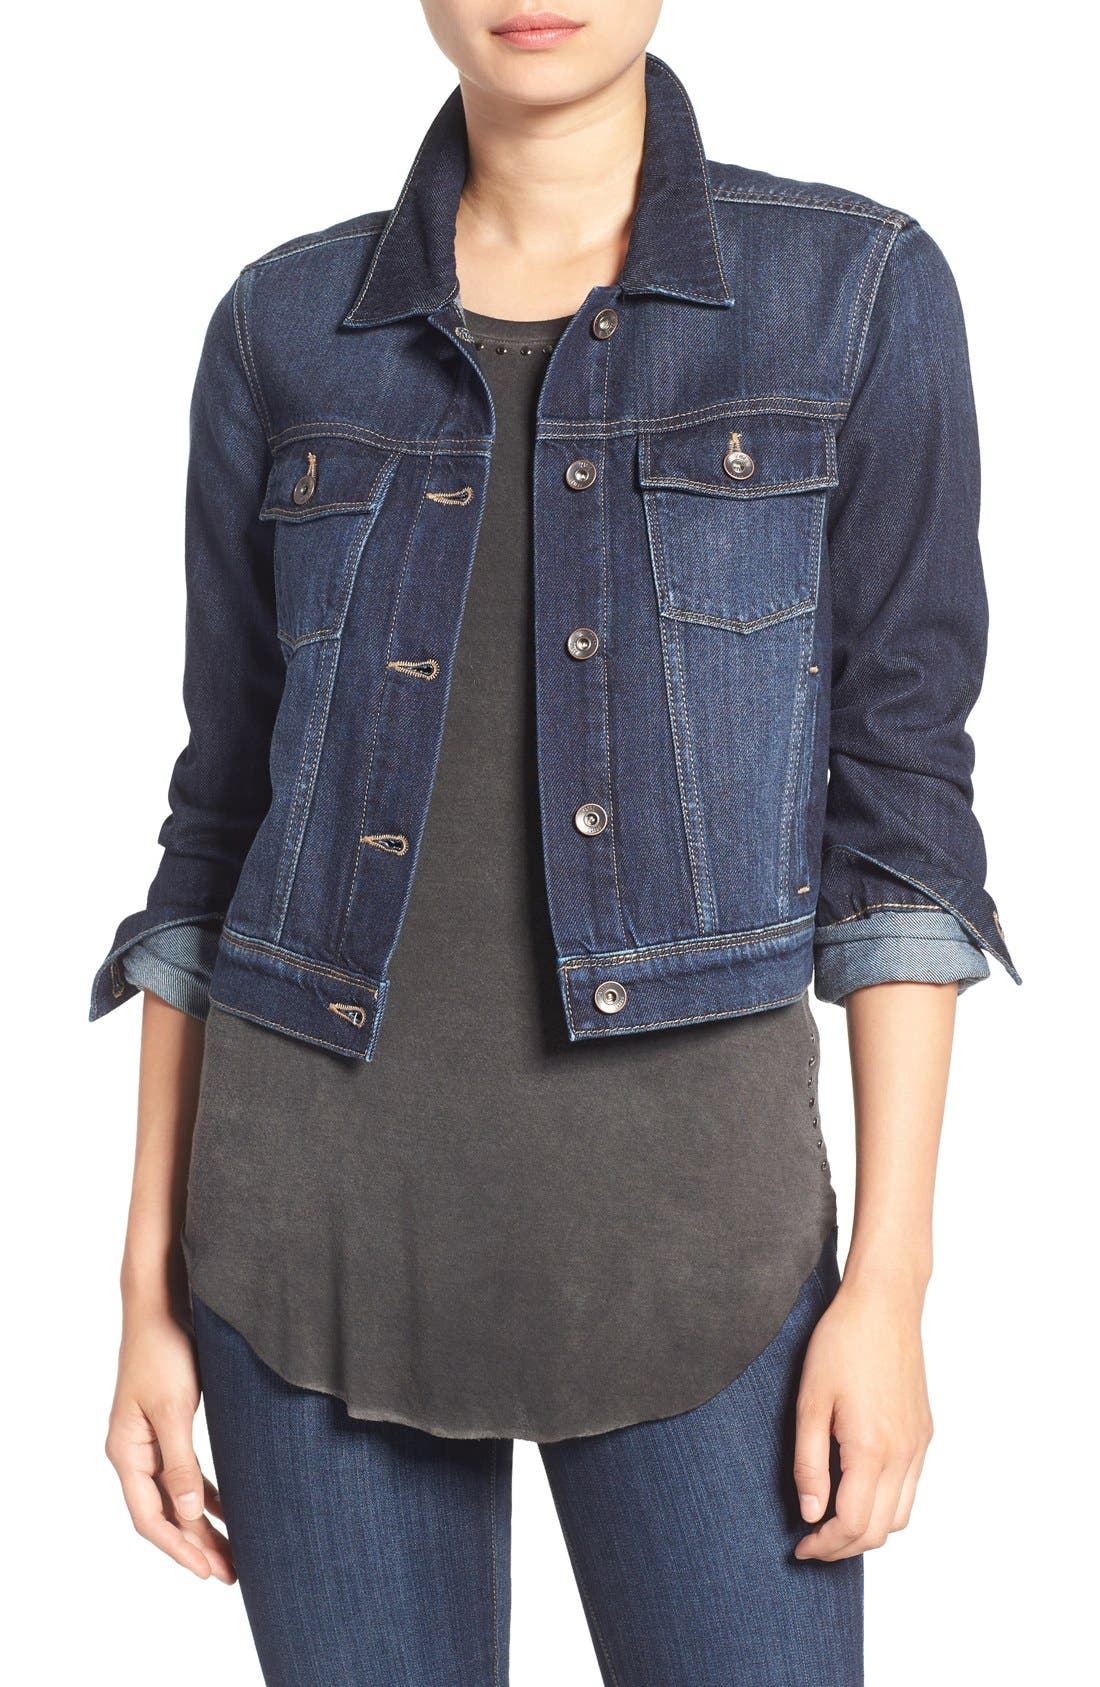 Main Image - PAIGE 'Vivienne' Denim Jacket (Arwen)